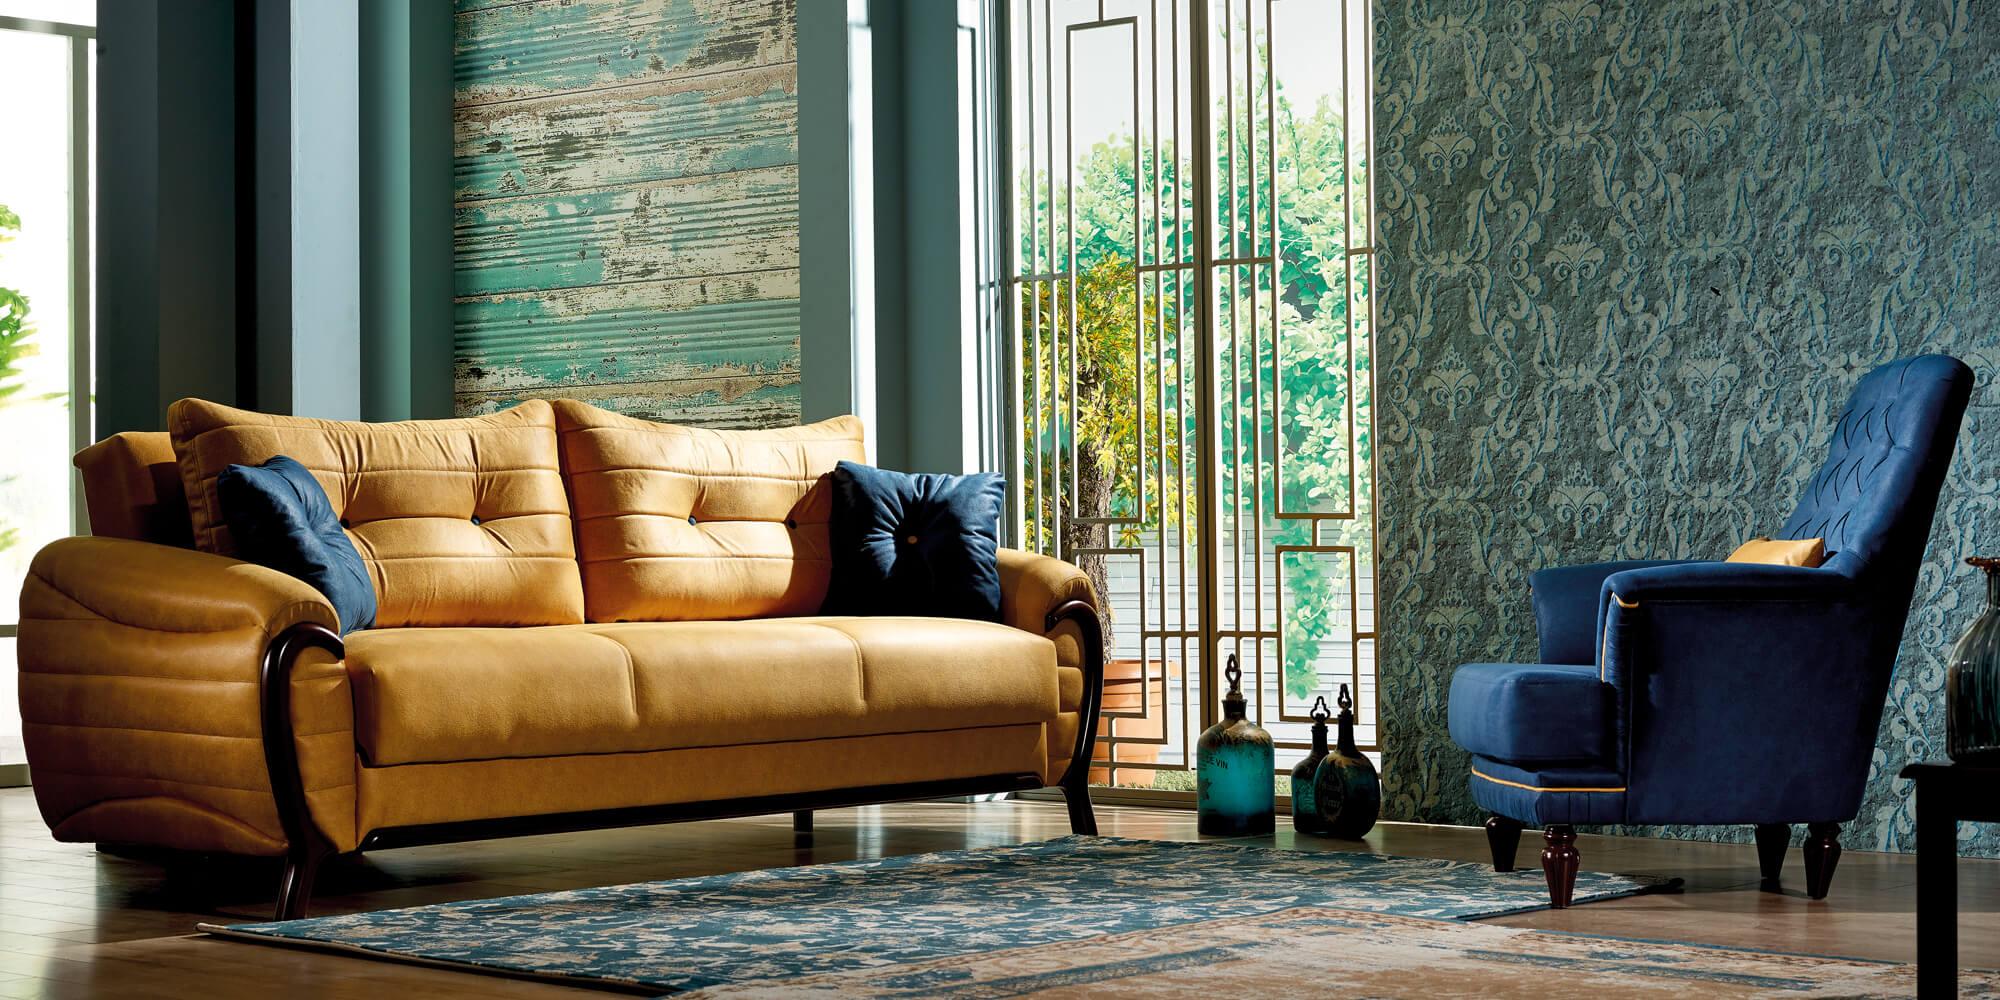 bobo 3 2 1 delux sofa set yuvam m belhaus in wuppertal cilek offizieller h ndler in europa. Black Bedroom Furniture Sets. Home Design Ideas